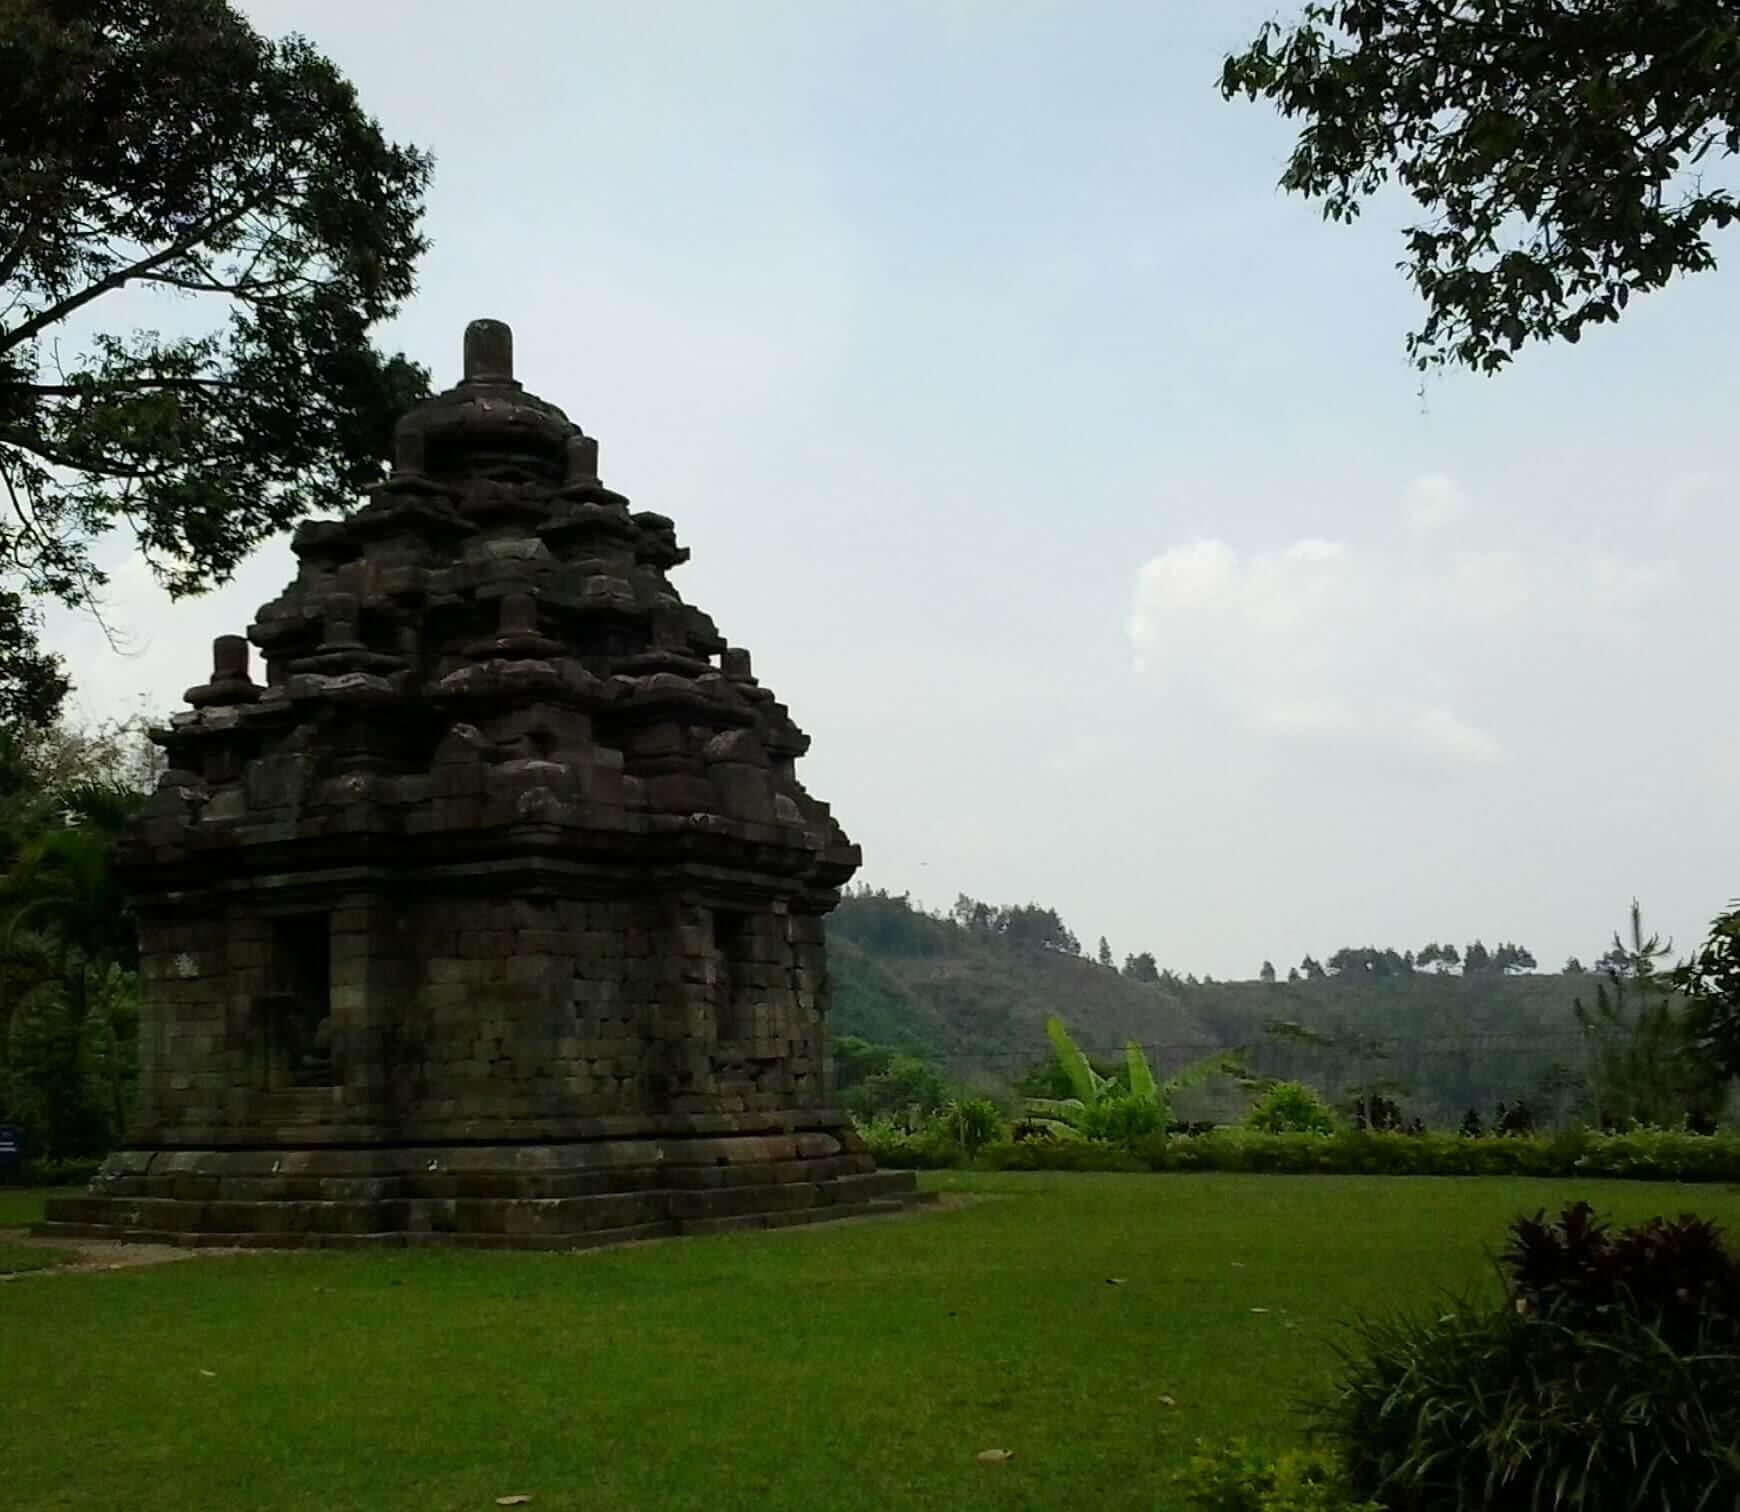 Pesona 13 Tempat Wisata Budaya Sejarah Kabupaten Magelang Candi Selogriyo